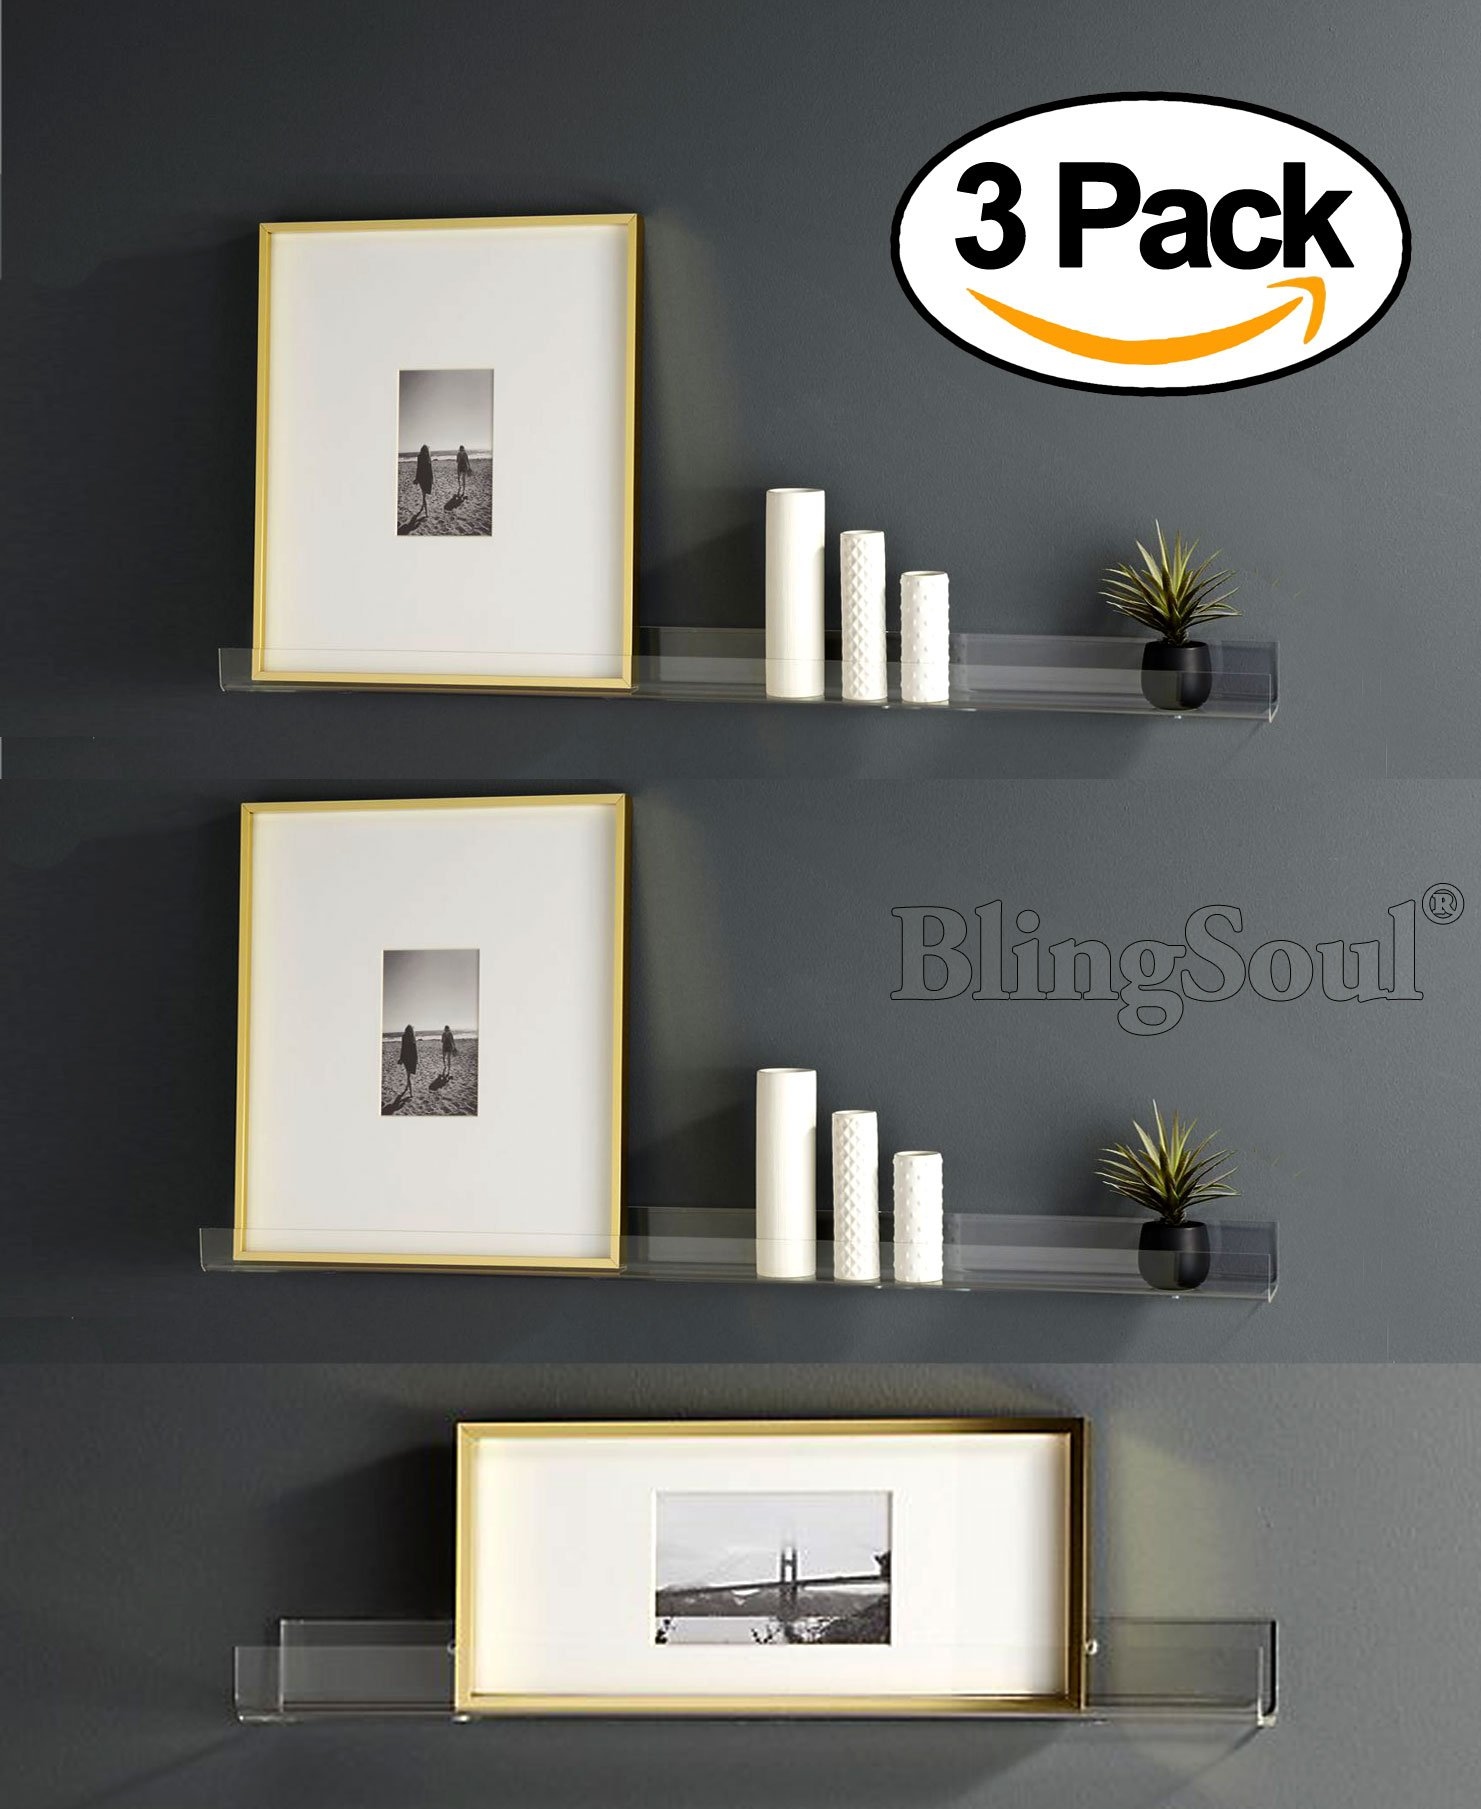 3 Heavy Duty Clear Floating Shelf Set, Crystal Acrylic Bathroom Shelves, Shower Caddy, Nail Polish Women Makeup Organizer, Spice Rack Kids Room Wall Decor Display Bookshelf